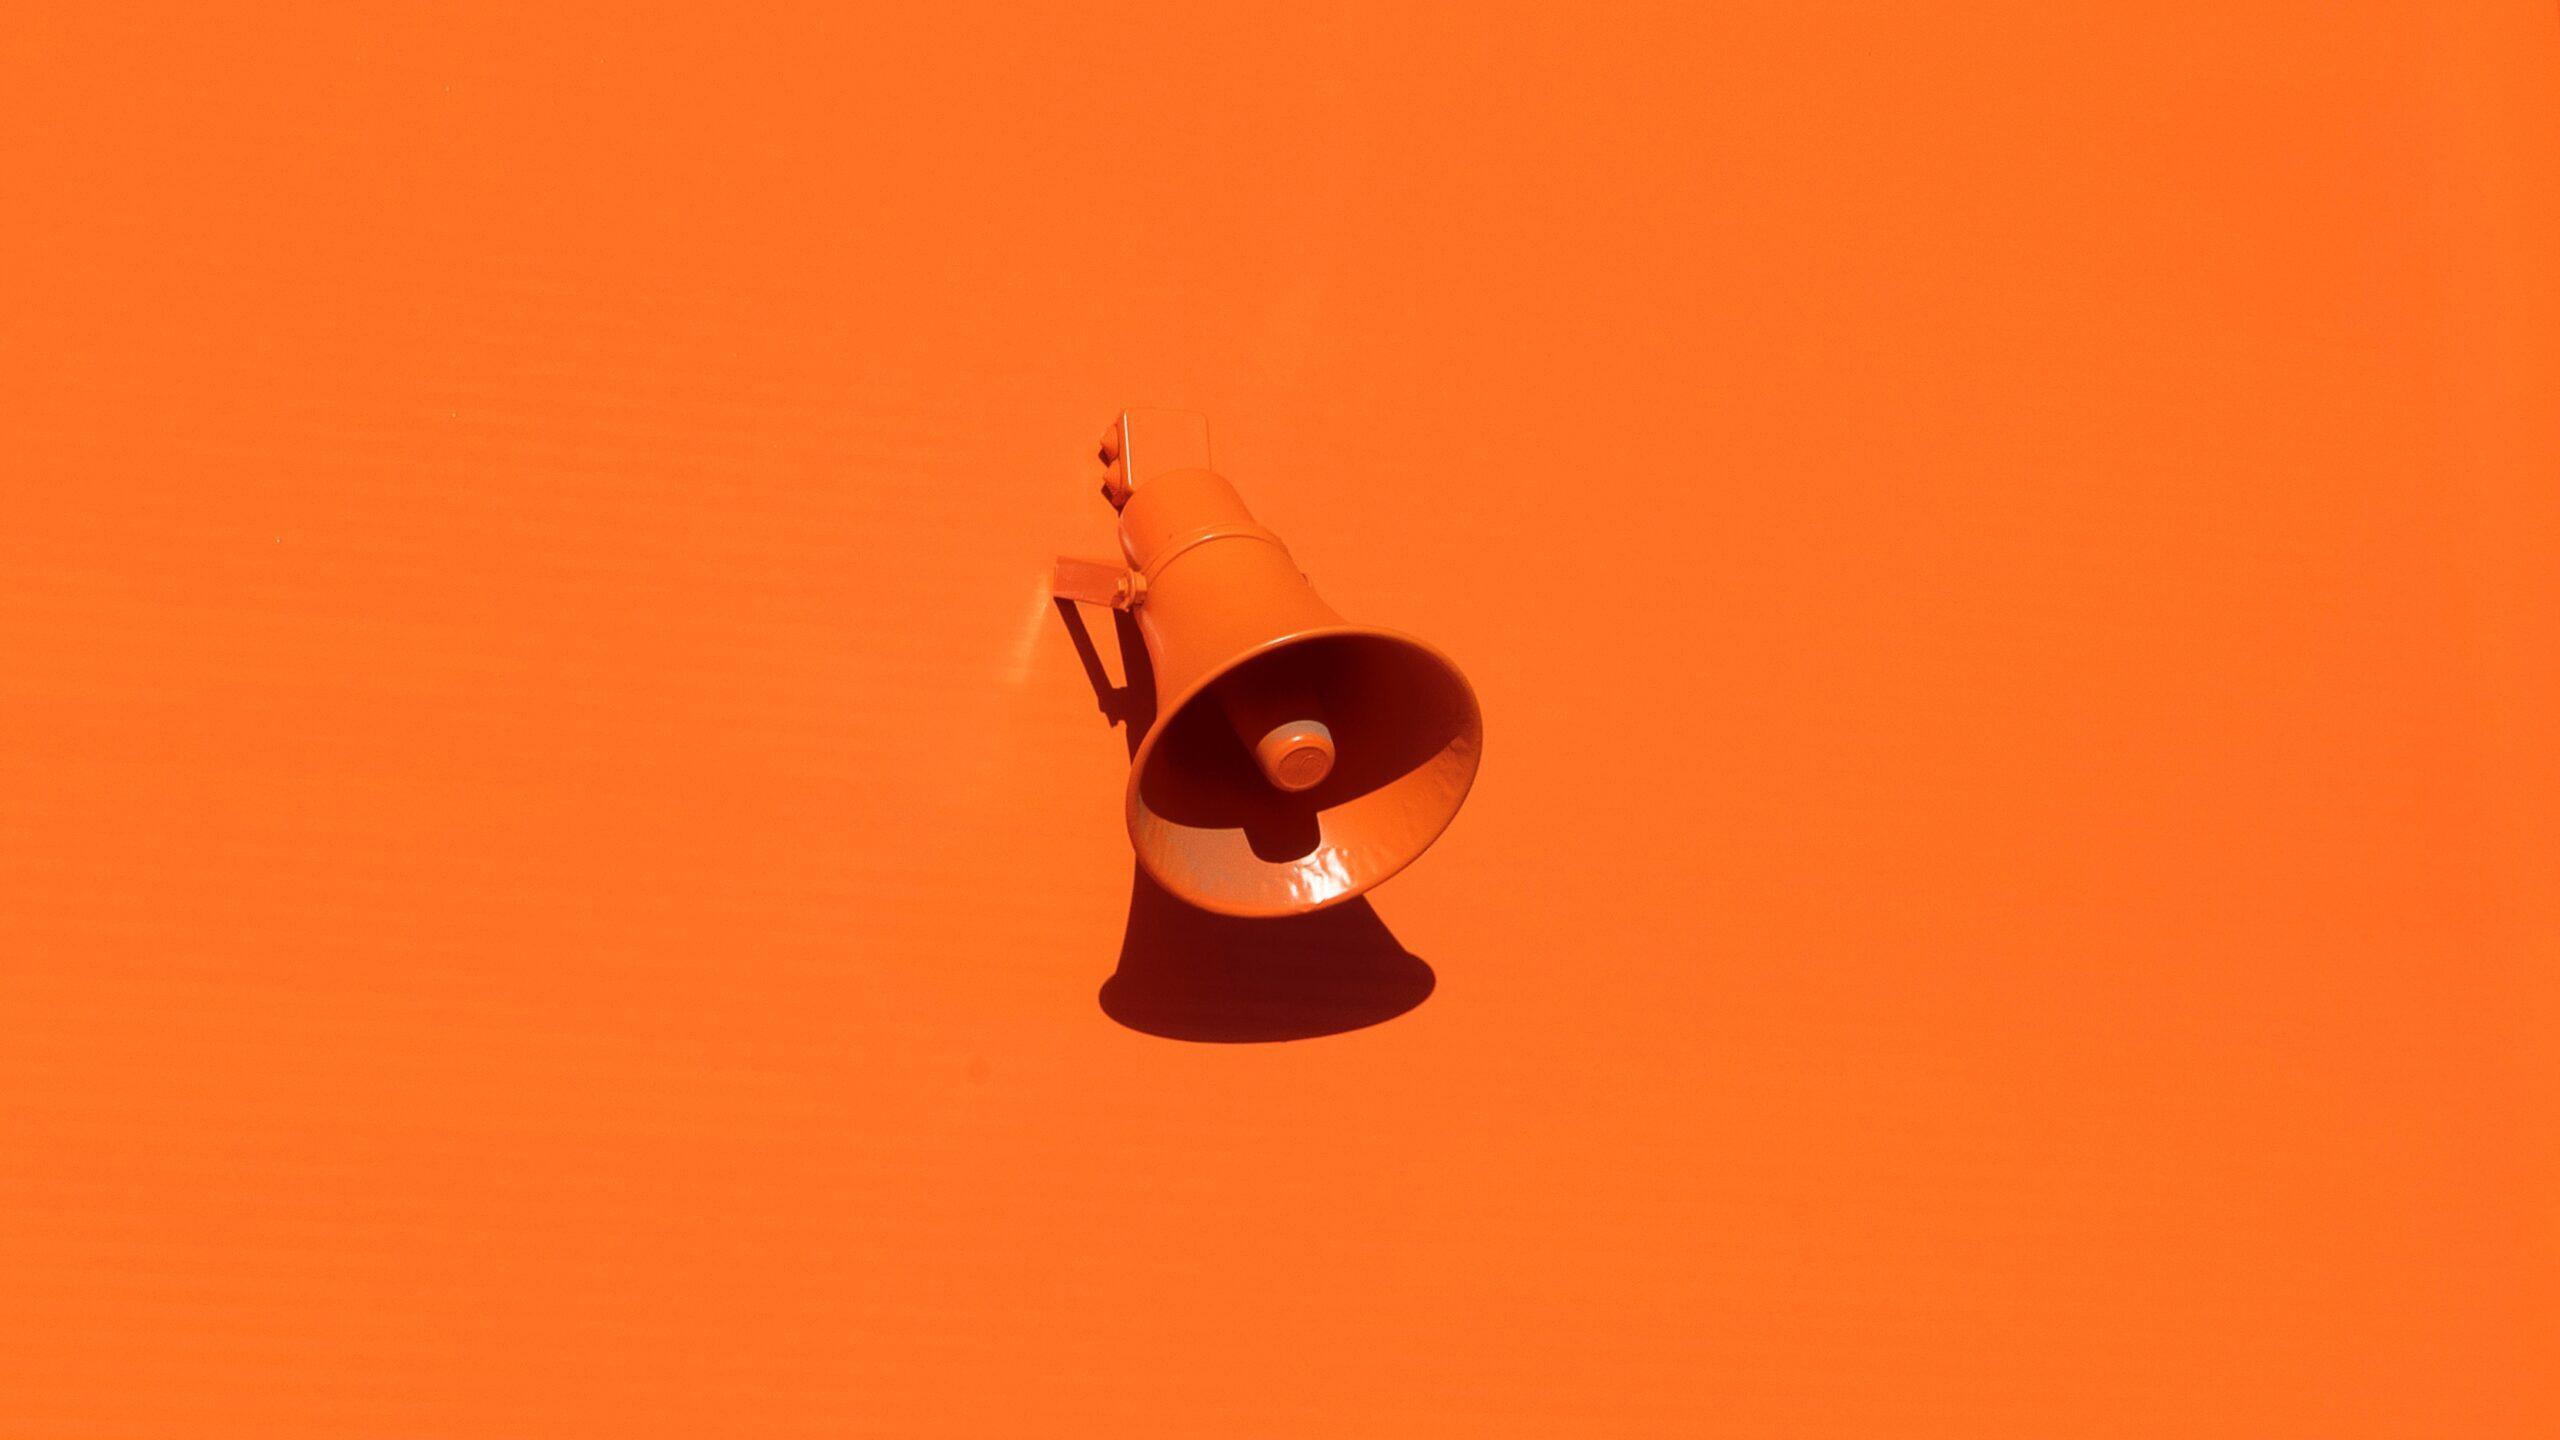 An orange megaphone on an orange background